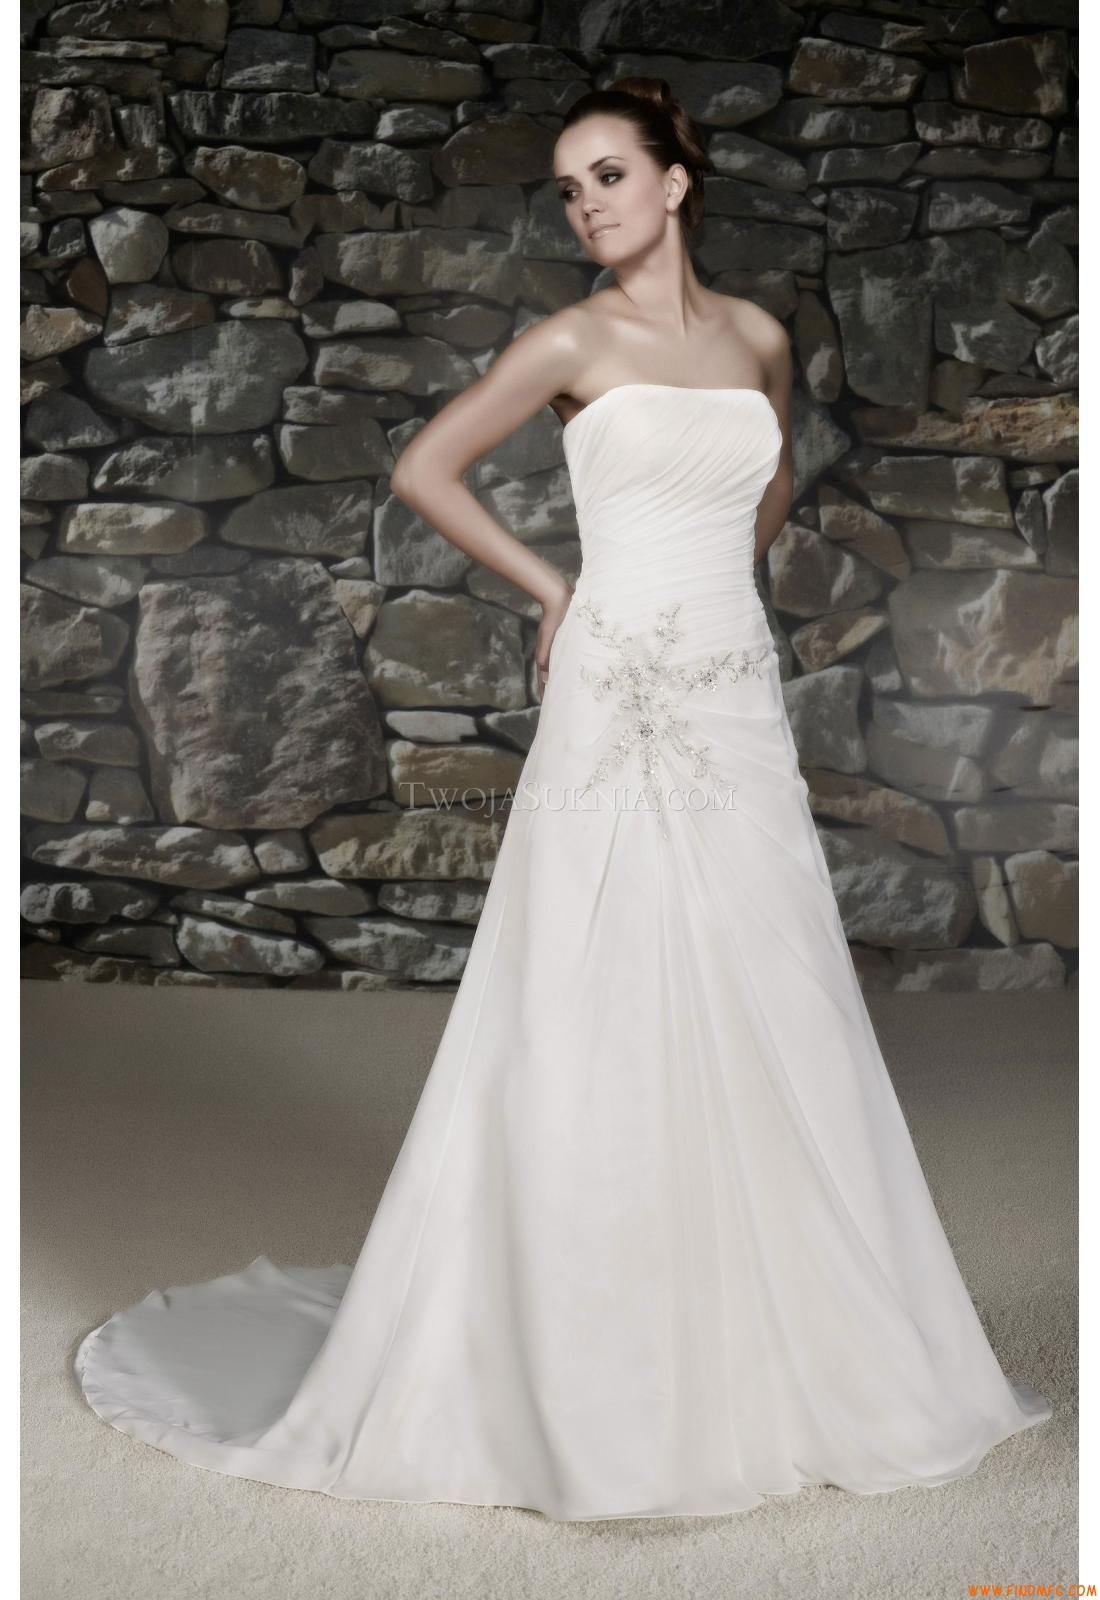 Vestidos de noiva Lisa Donetti 70232 2012